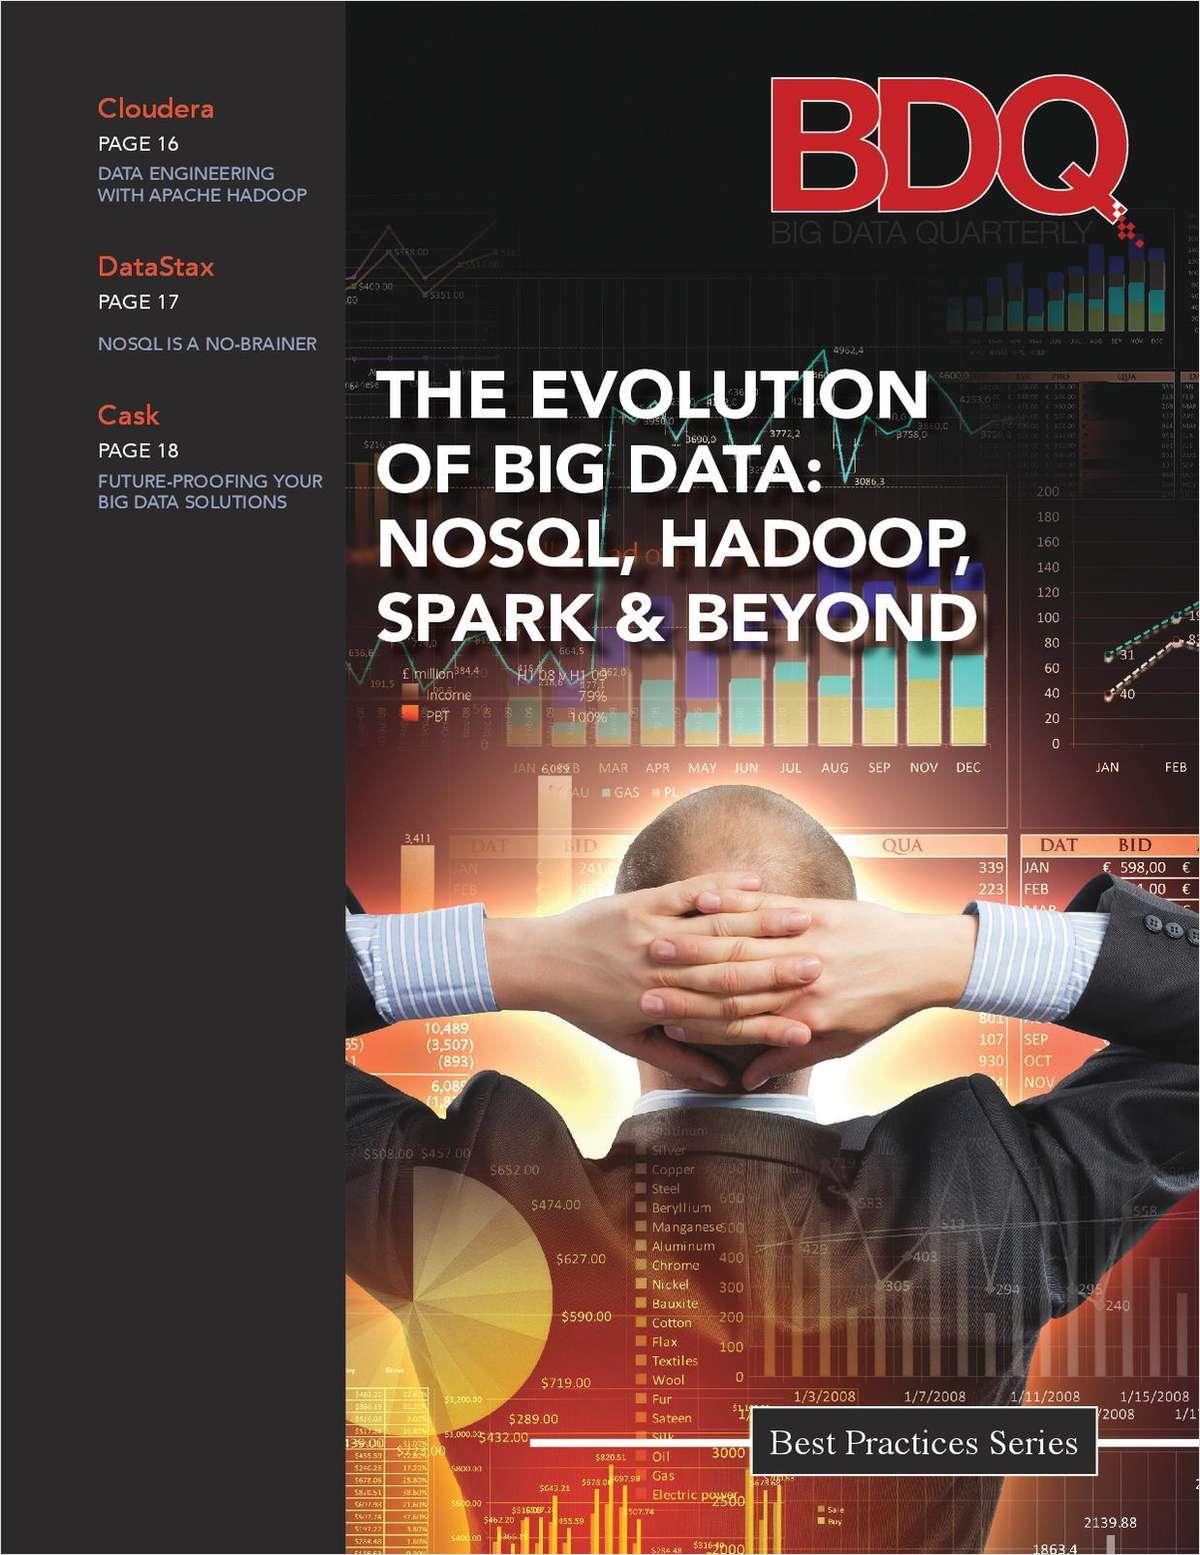 The Evolution of Big Data